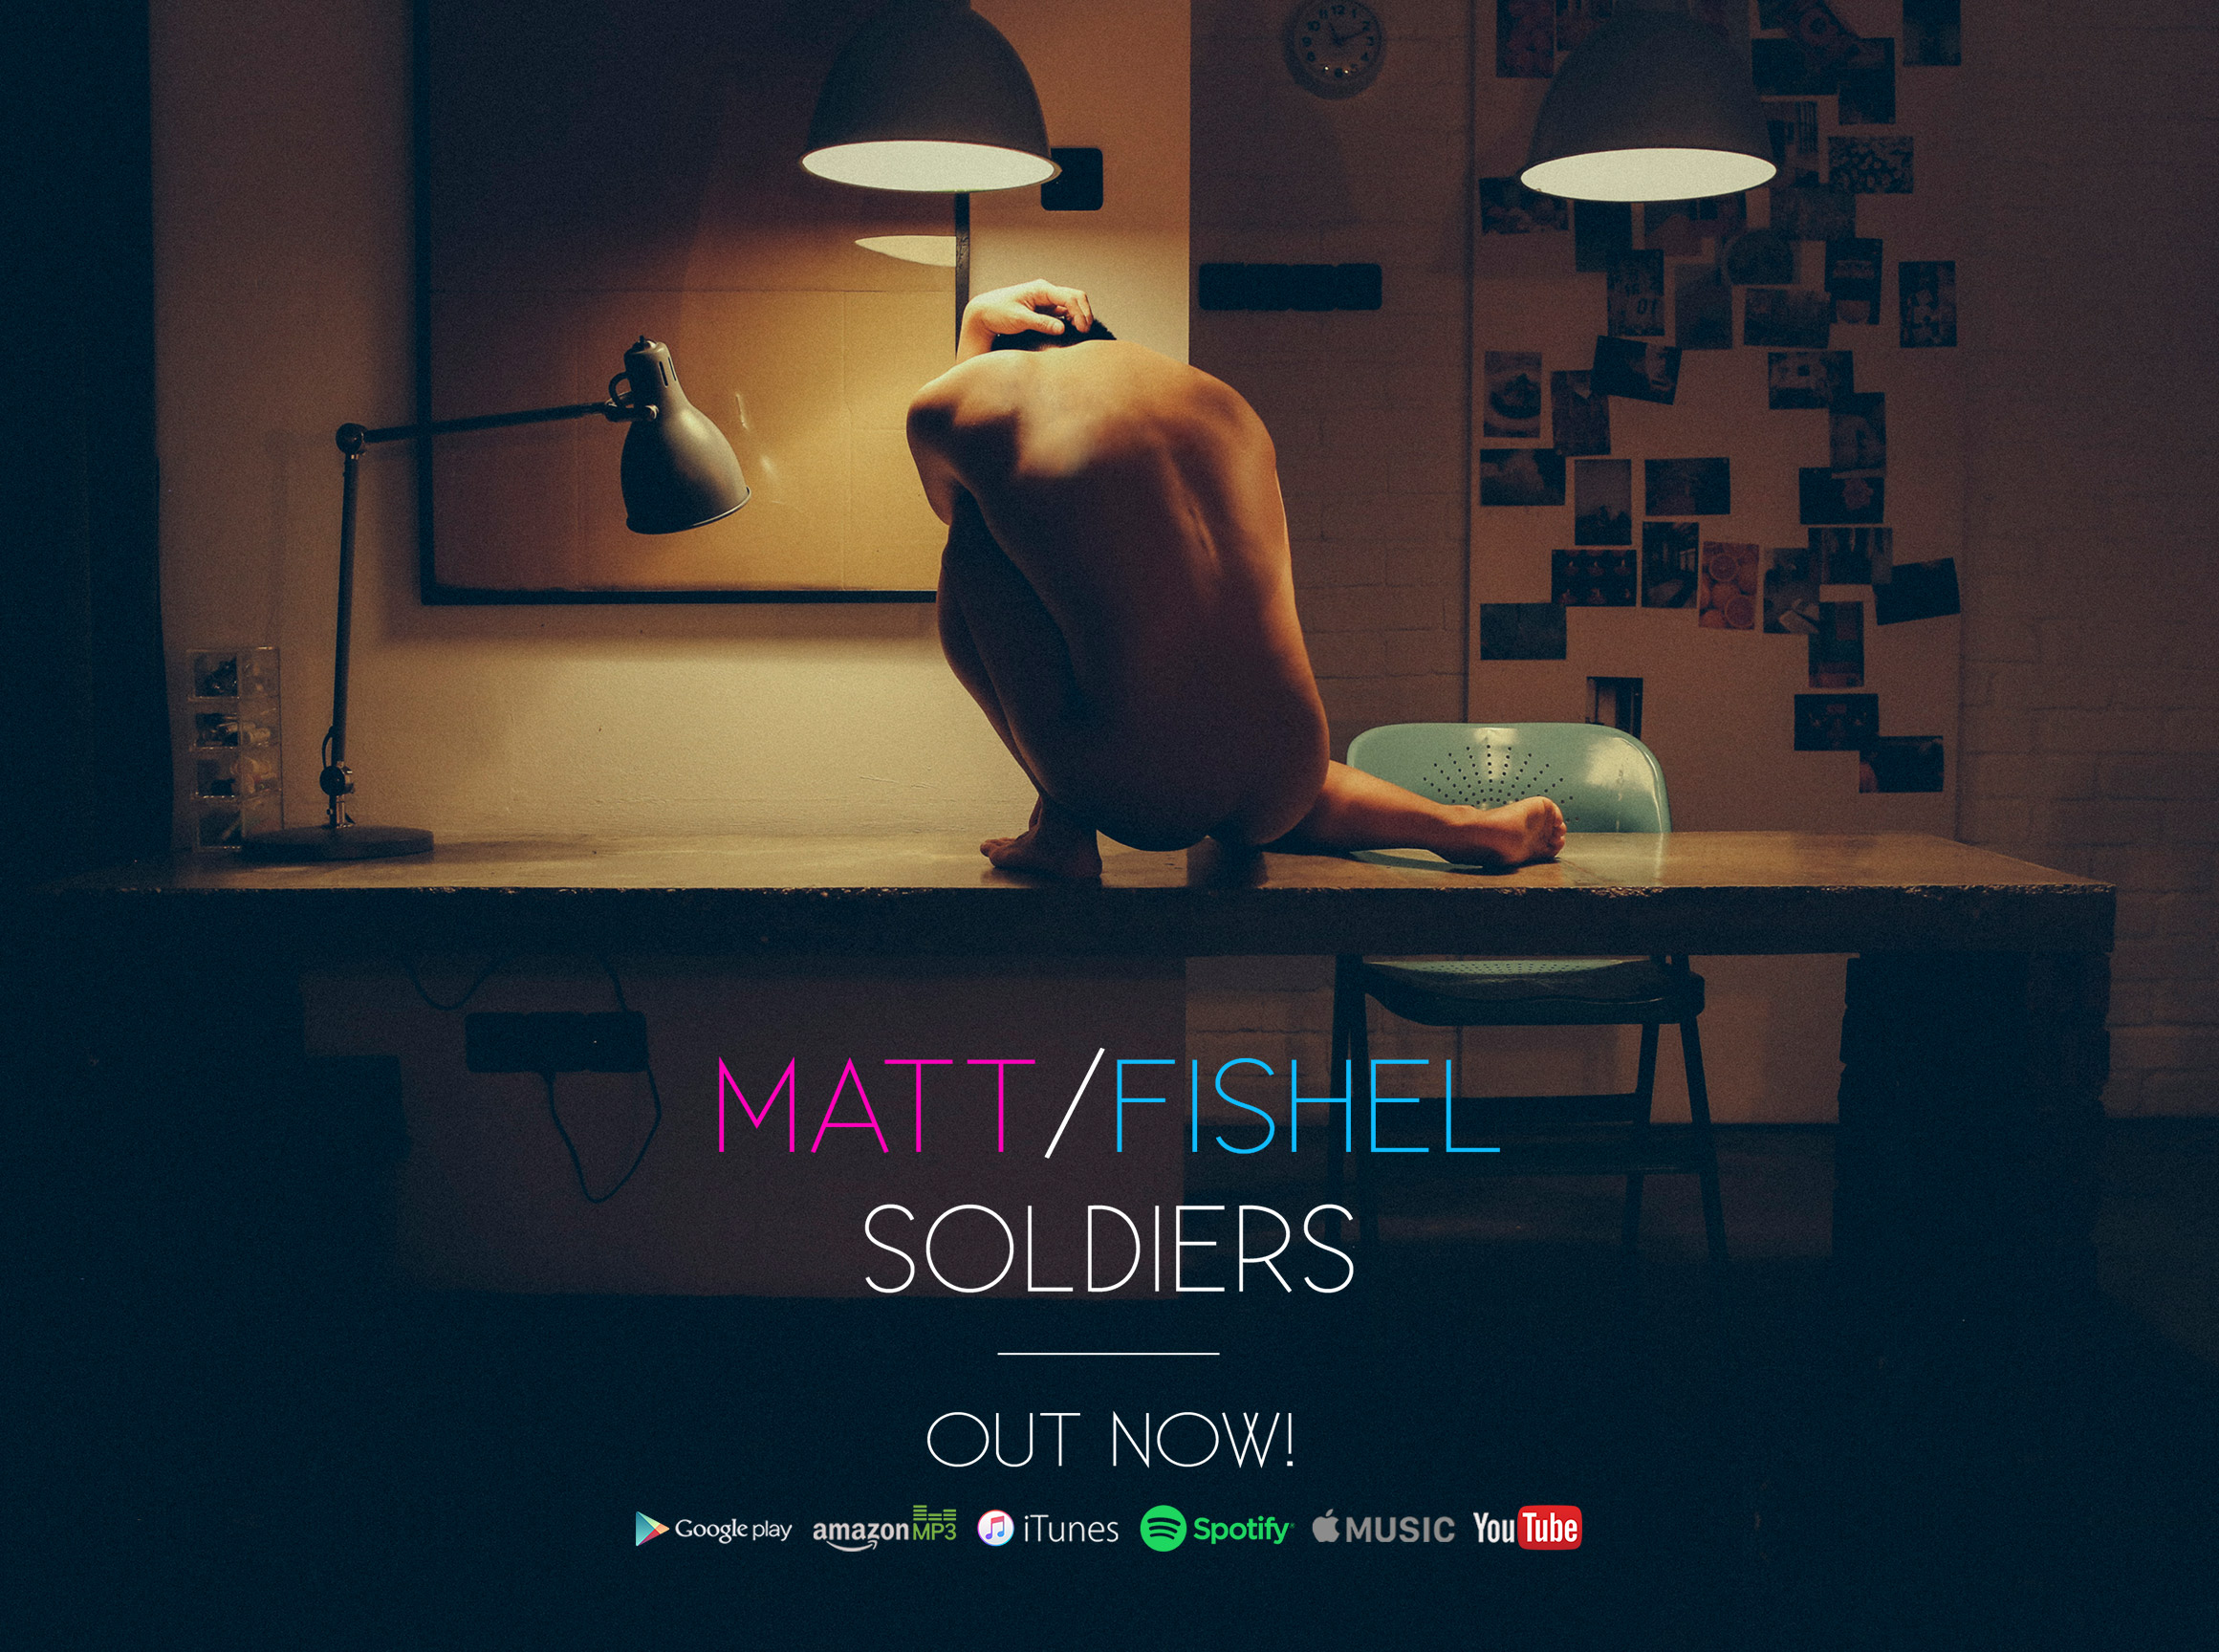 Matt FIshel_Soldiers_07.jpg